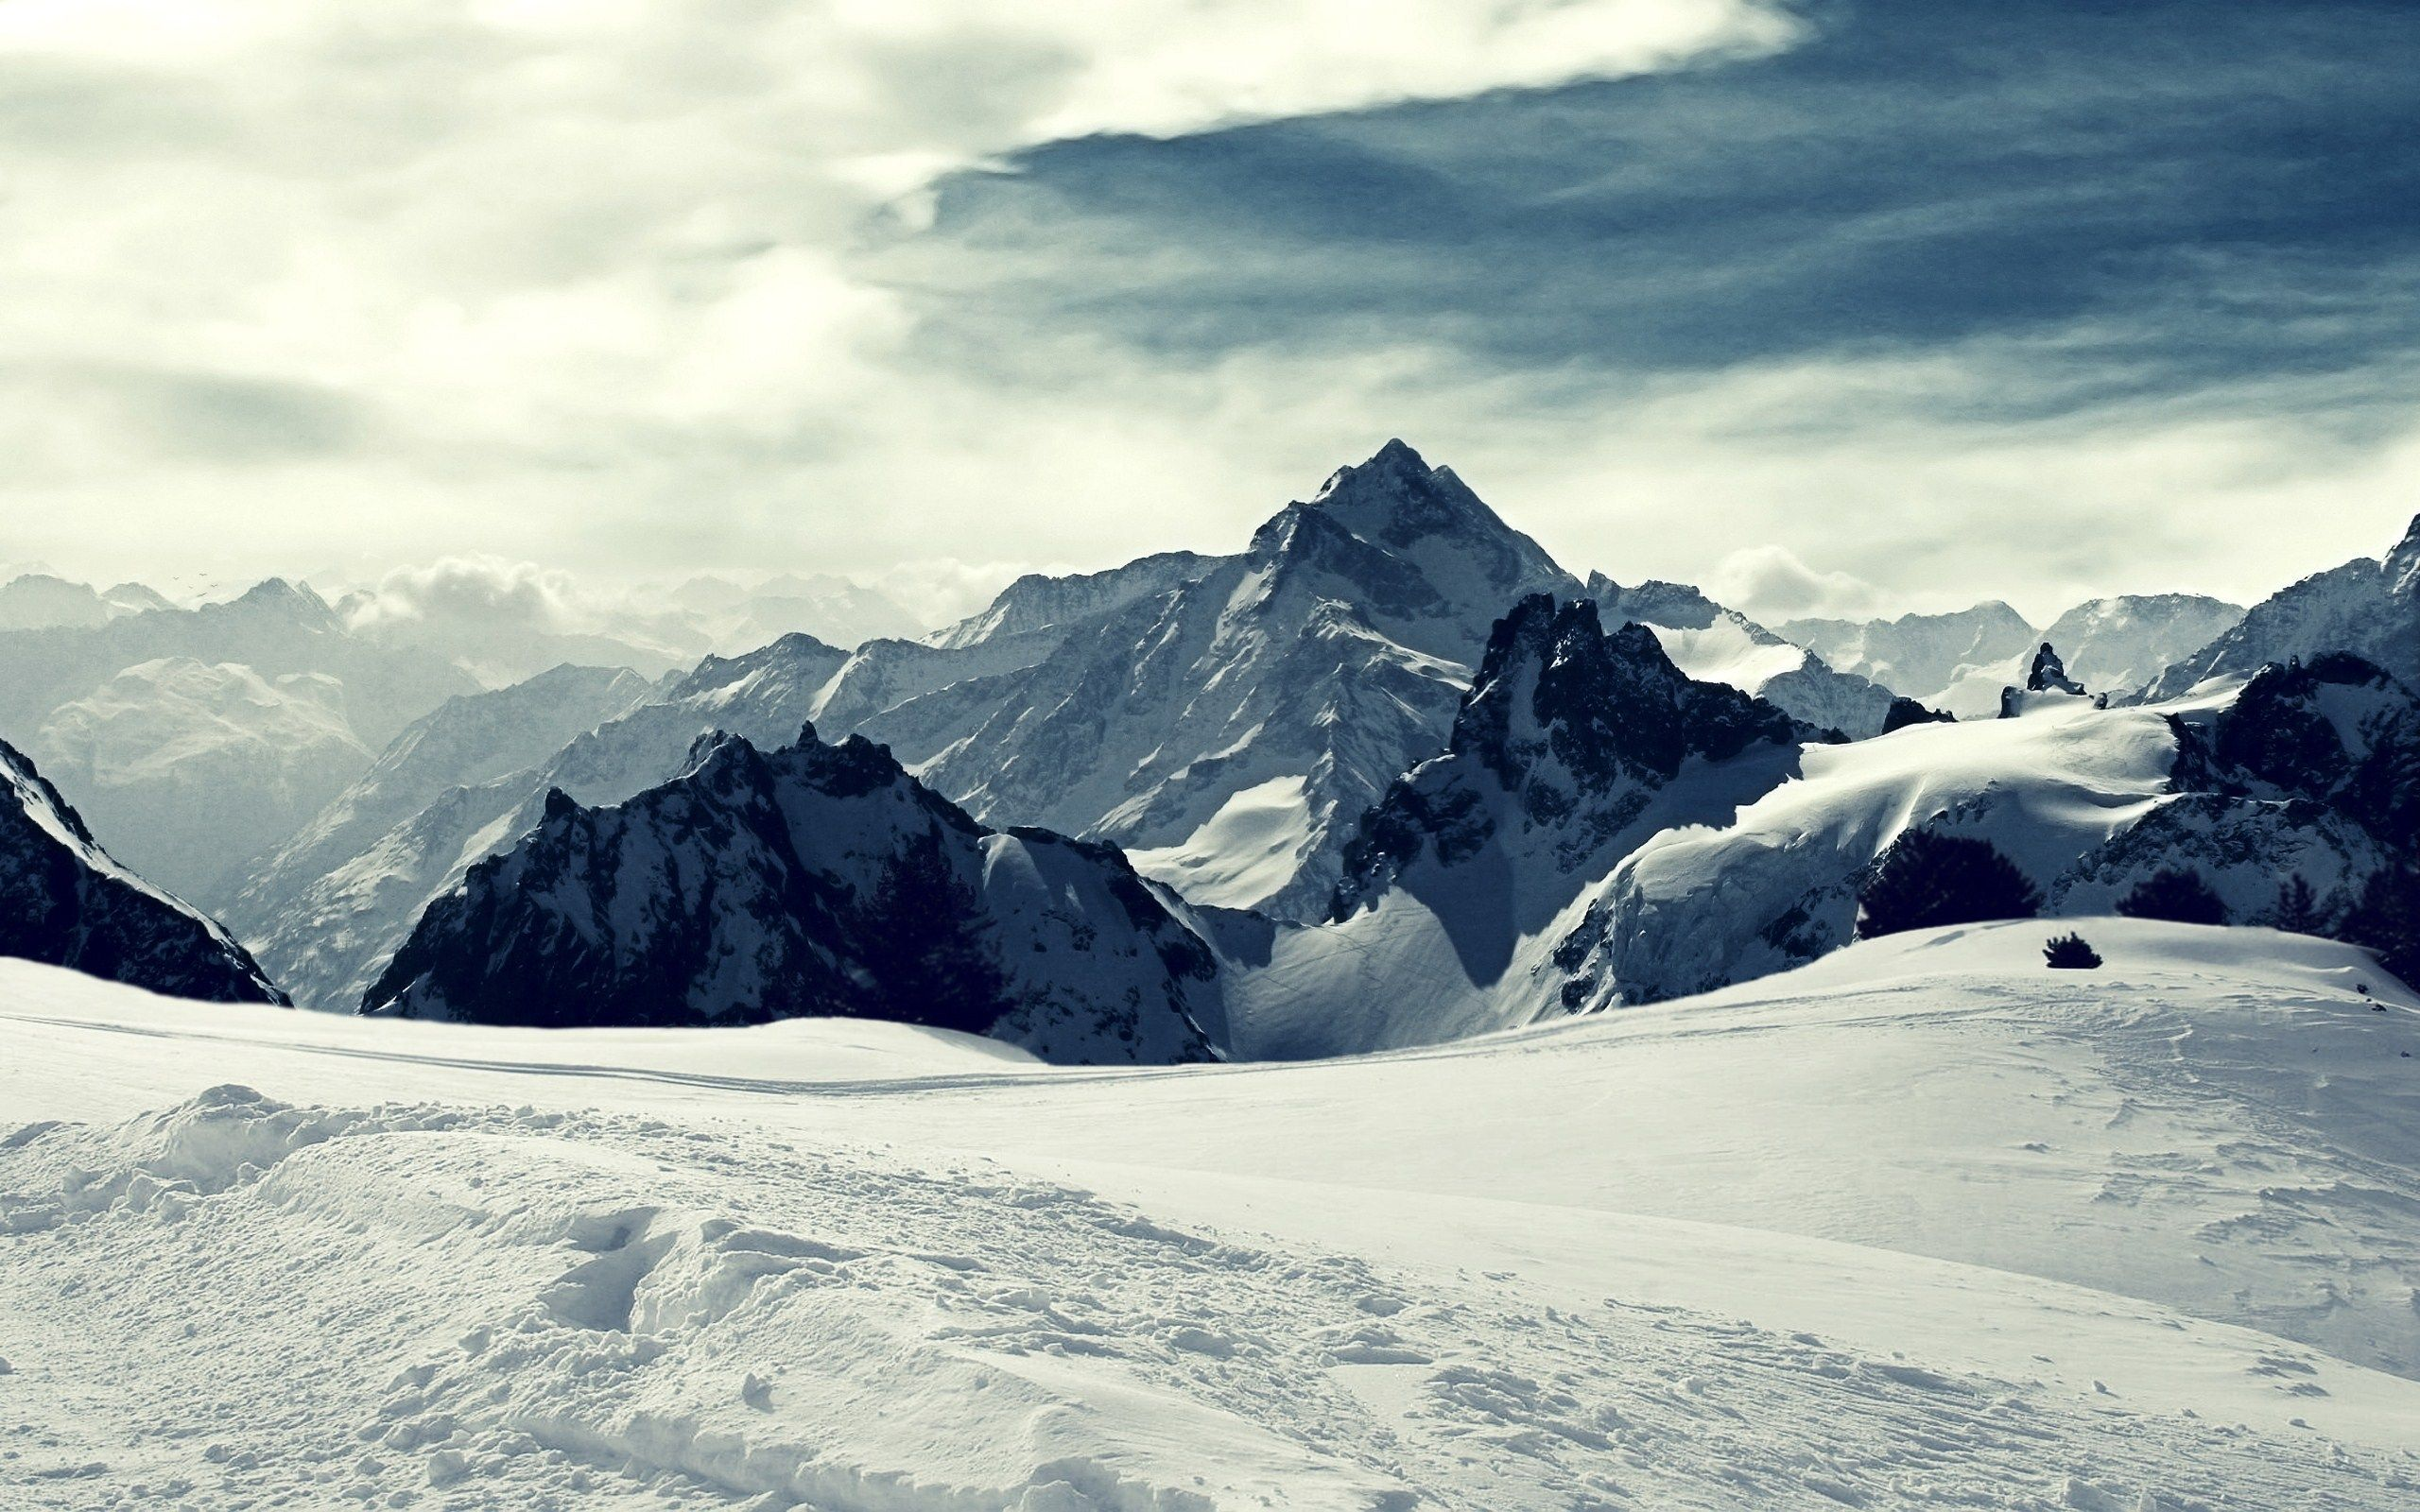 Ice Mountains View Mountain Wallpaper Mountain Pictures Art Wallpaper